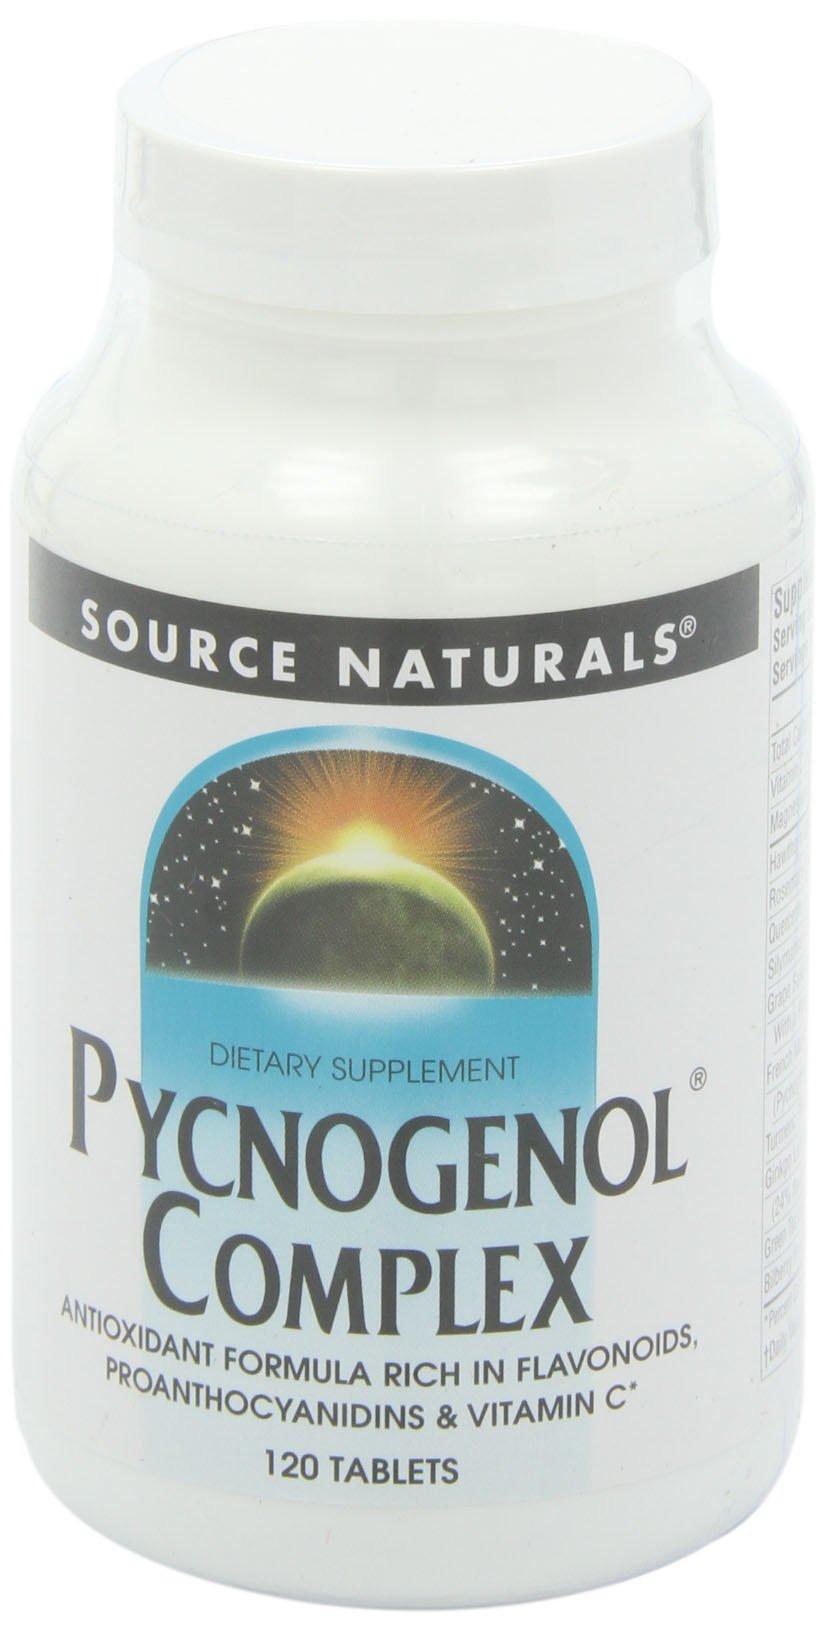 Source Naturals Pycnogenol Complex Antioxidant Formula Rich In Flavonoids, Proanthocyanidins & Vitamin C - 120 Tablets